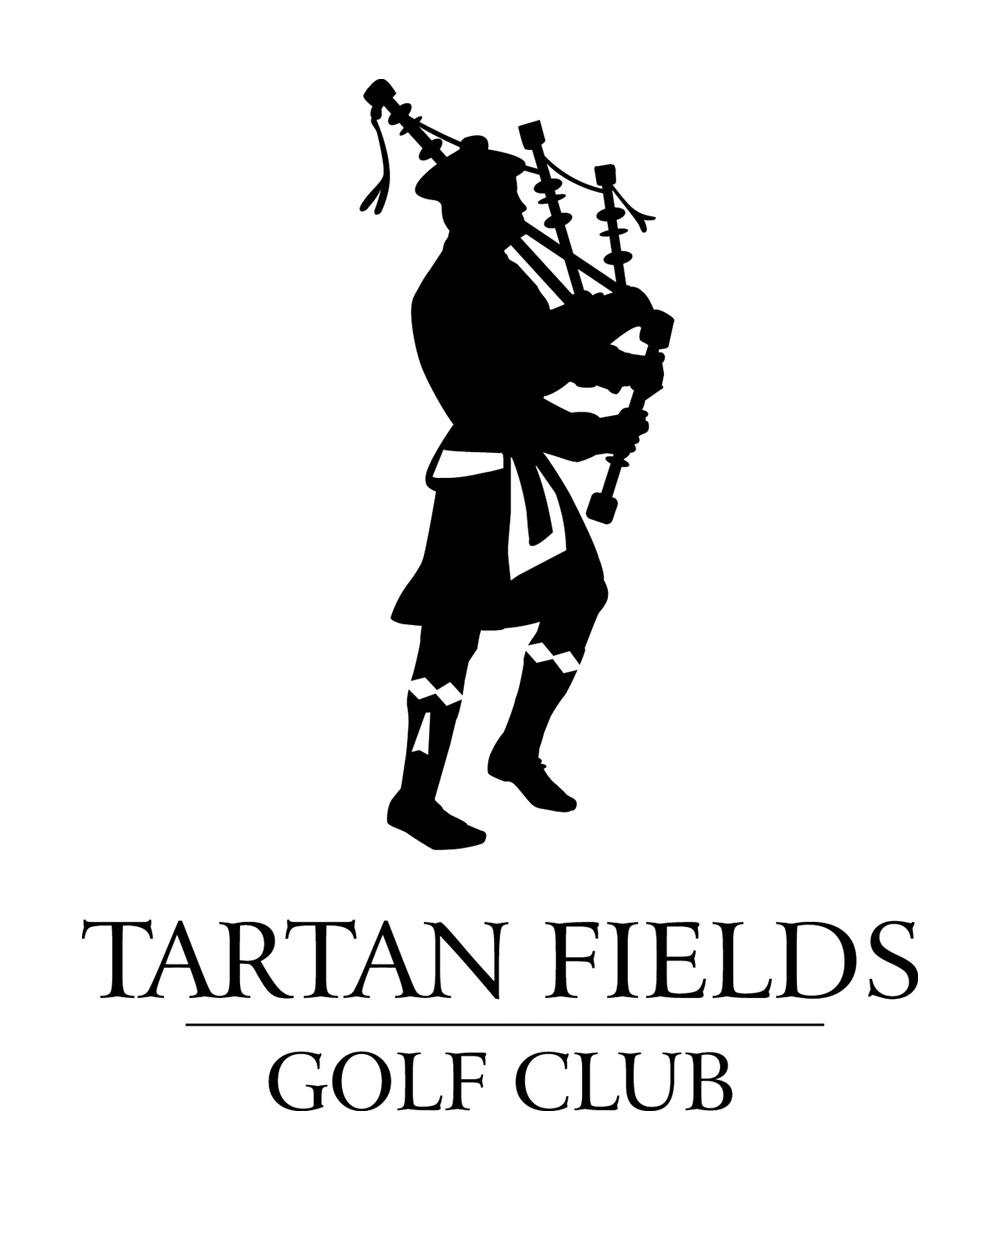 https://www.yourattache.co/wp-content/uploads/2016/11/Tartan-Fields-Bagpiper_full-1.jpg